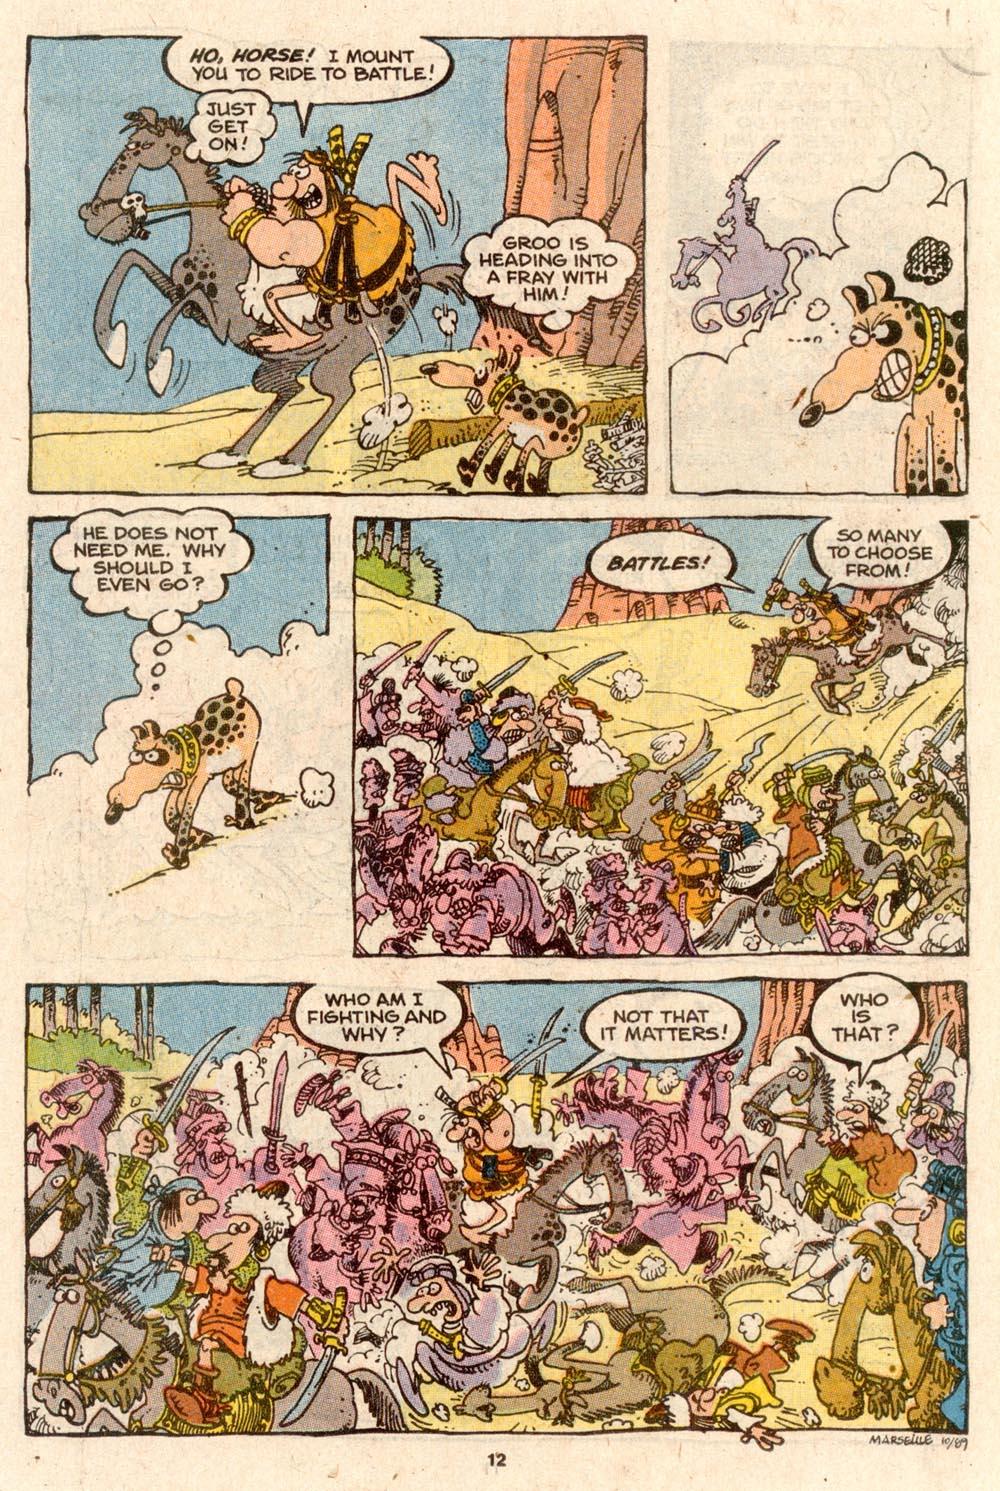 Read online Sergio Aragonés Groo the Wanderer comic -  Issue #62 - 13